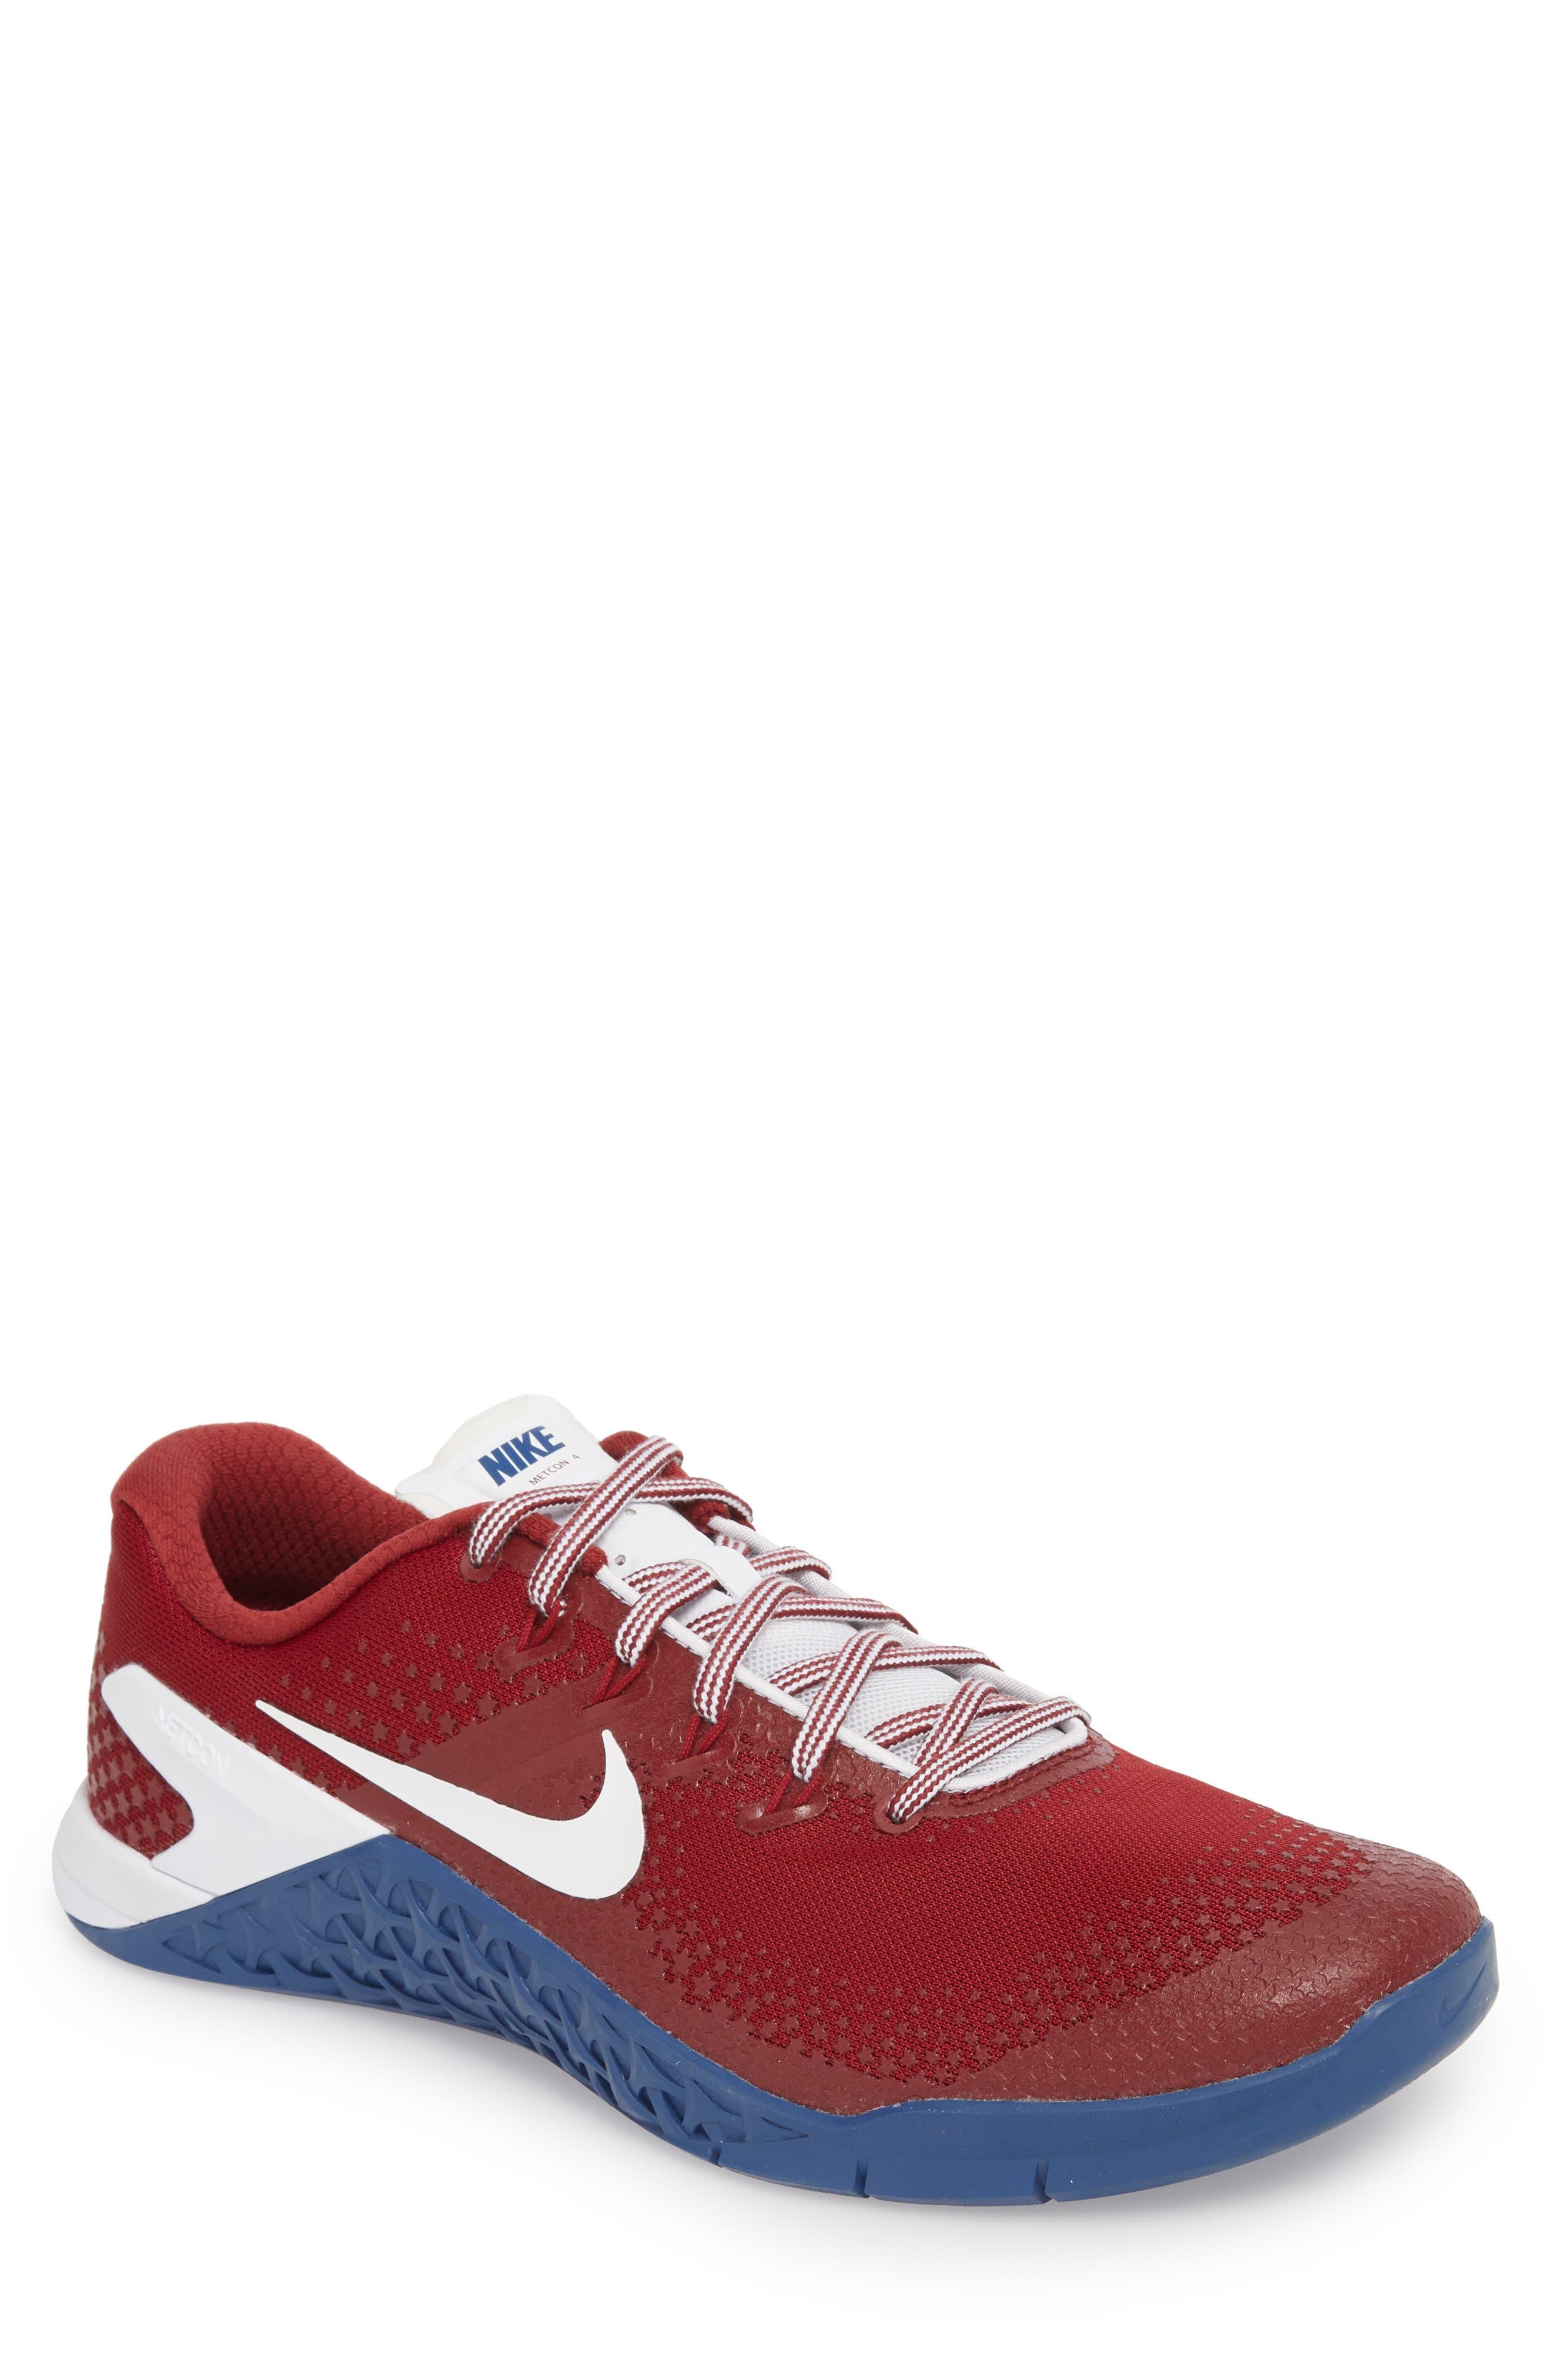 Metcon 4 Americana Training Shoe,                             Main thumbnail 1, color,                             TEAM RED/ WHITE/ GYM BLUE